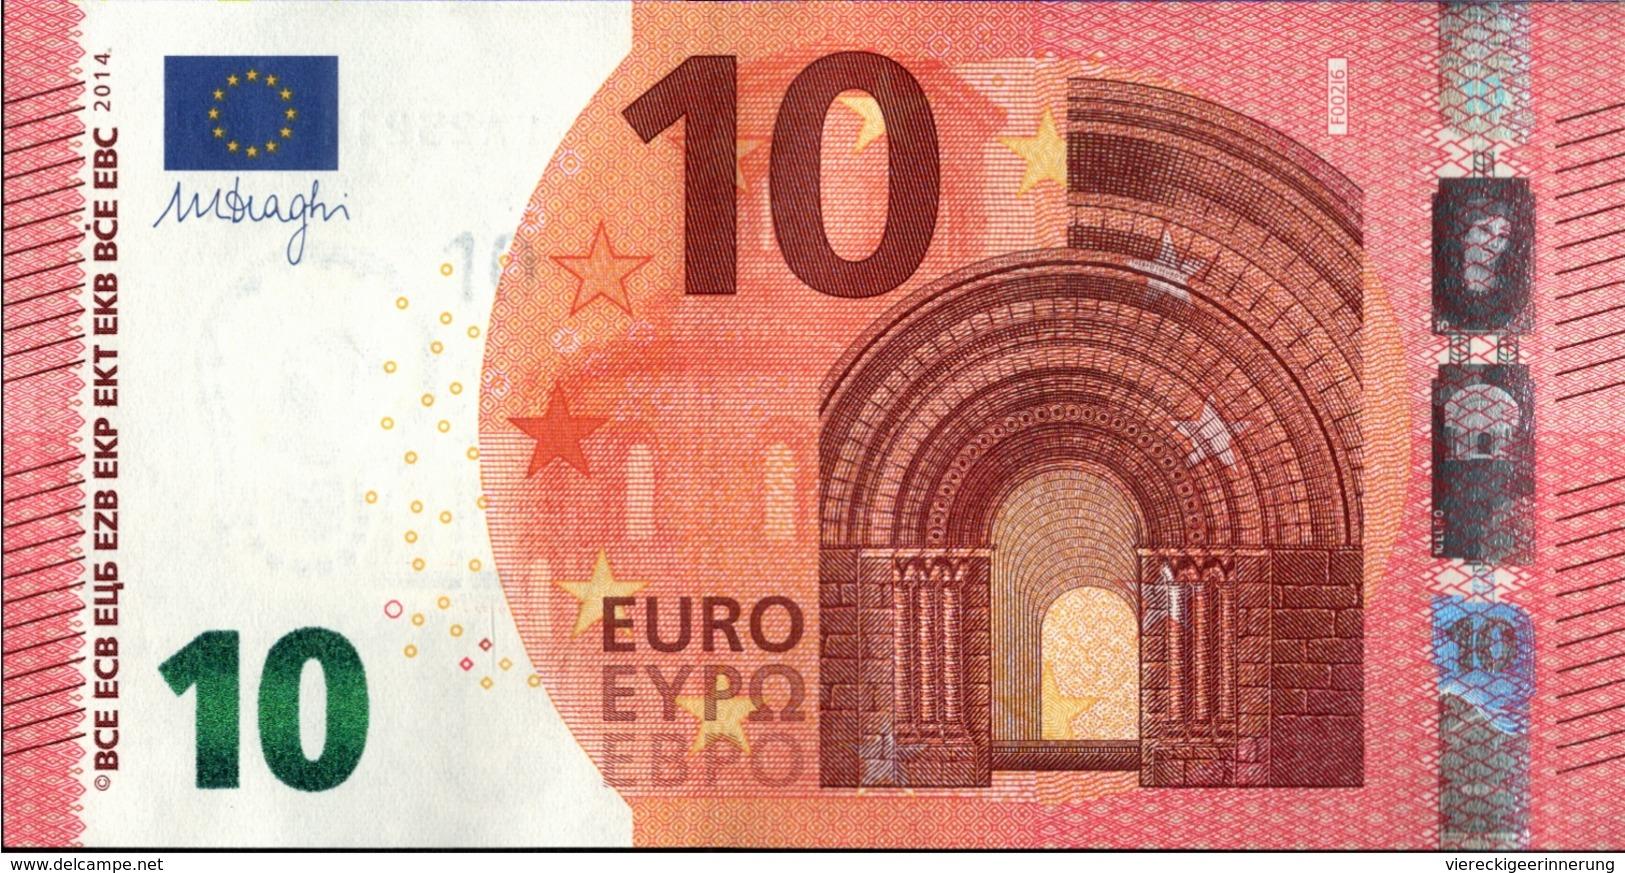 ! Unc. 10 Euro F002I6, FA2321198595,  Malta, Currency, Banknote, Billet Mario Draghi, EZB, Europäische Zentralbank - EURO